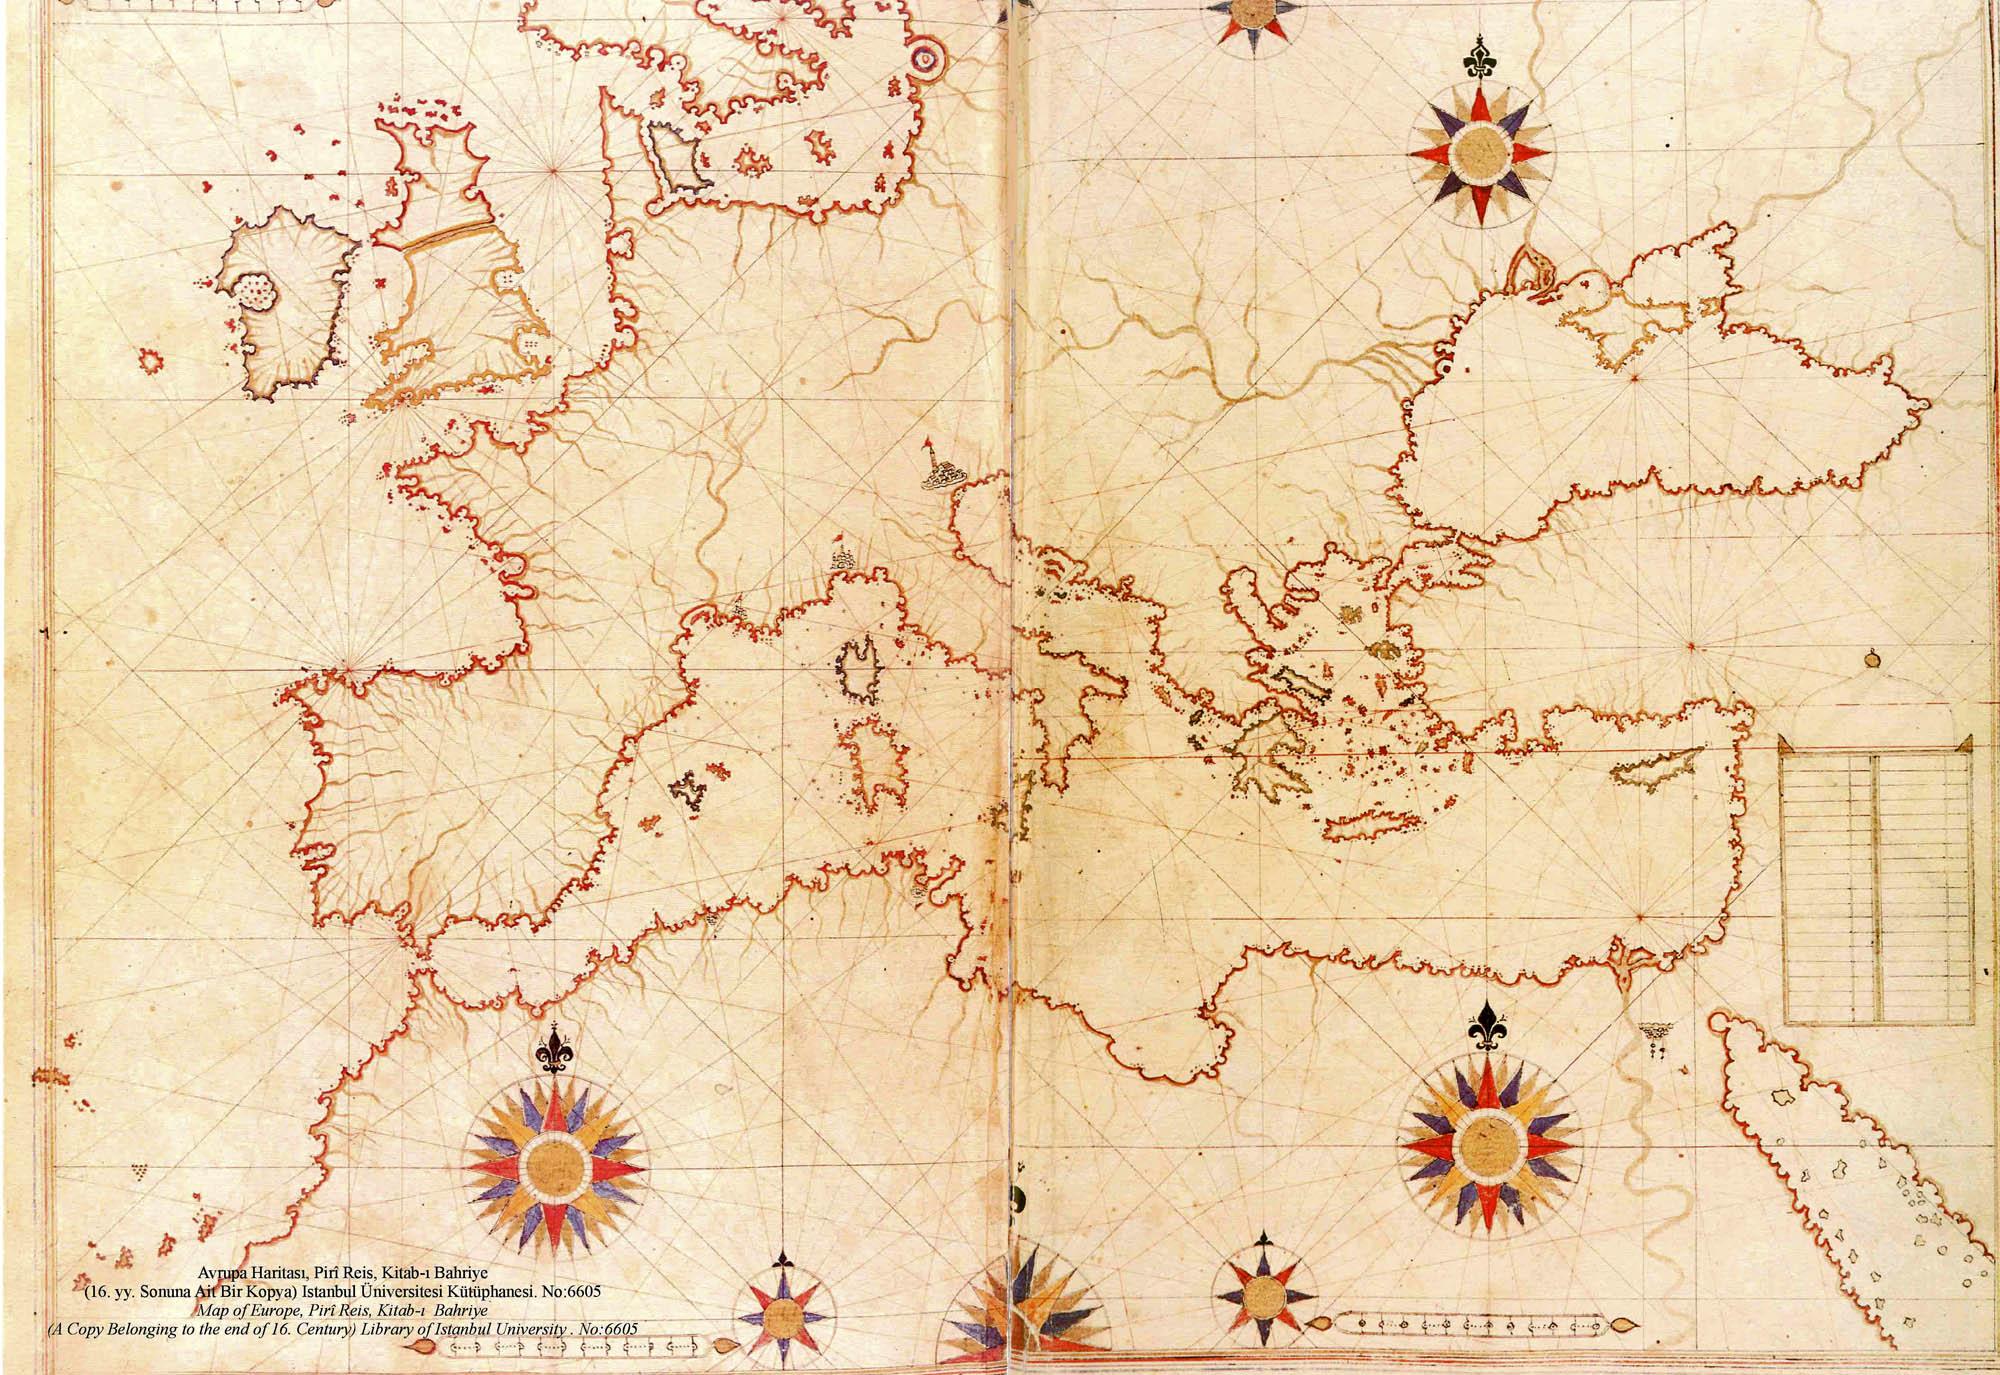 piri reis map of europe and the mediterranean sea